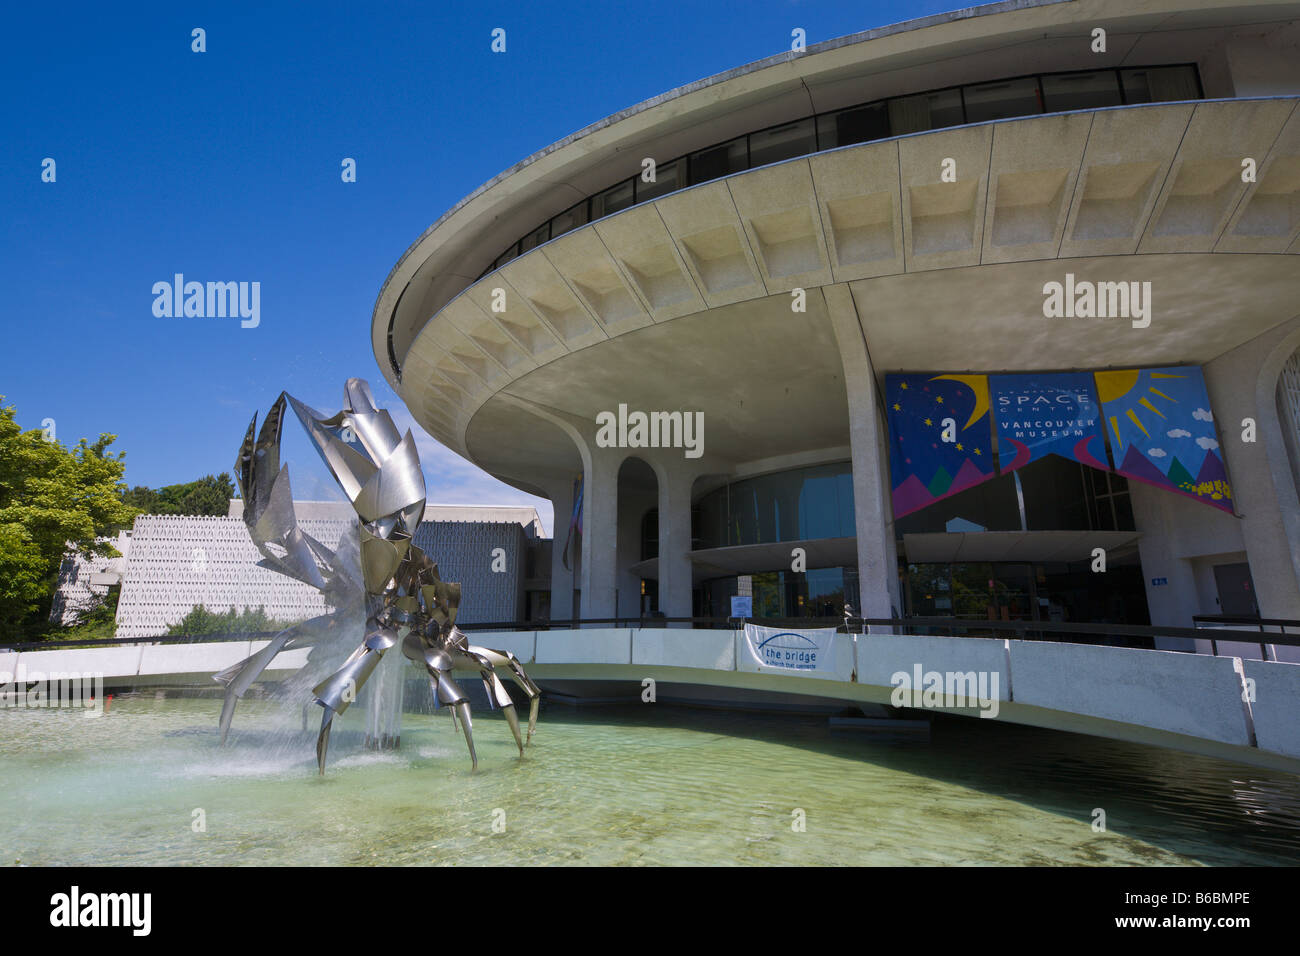 Vancouver Museum and Planetarium Vancouver 'British Columbia' Canada - Stock Image